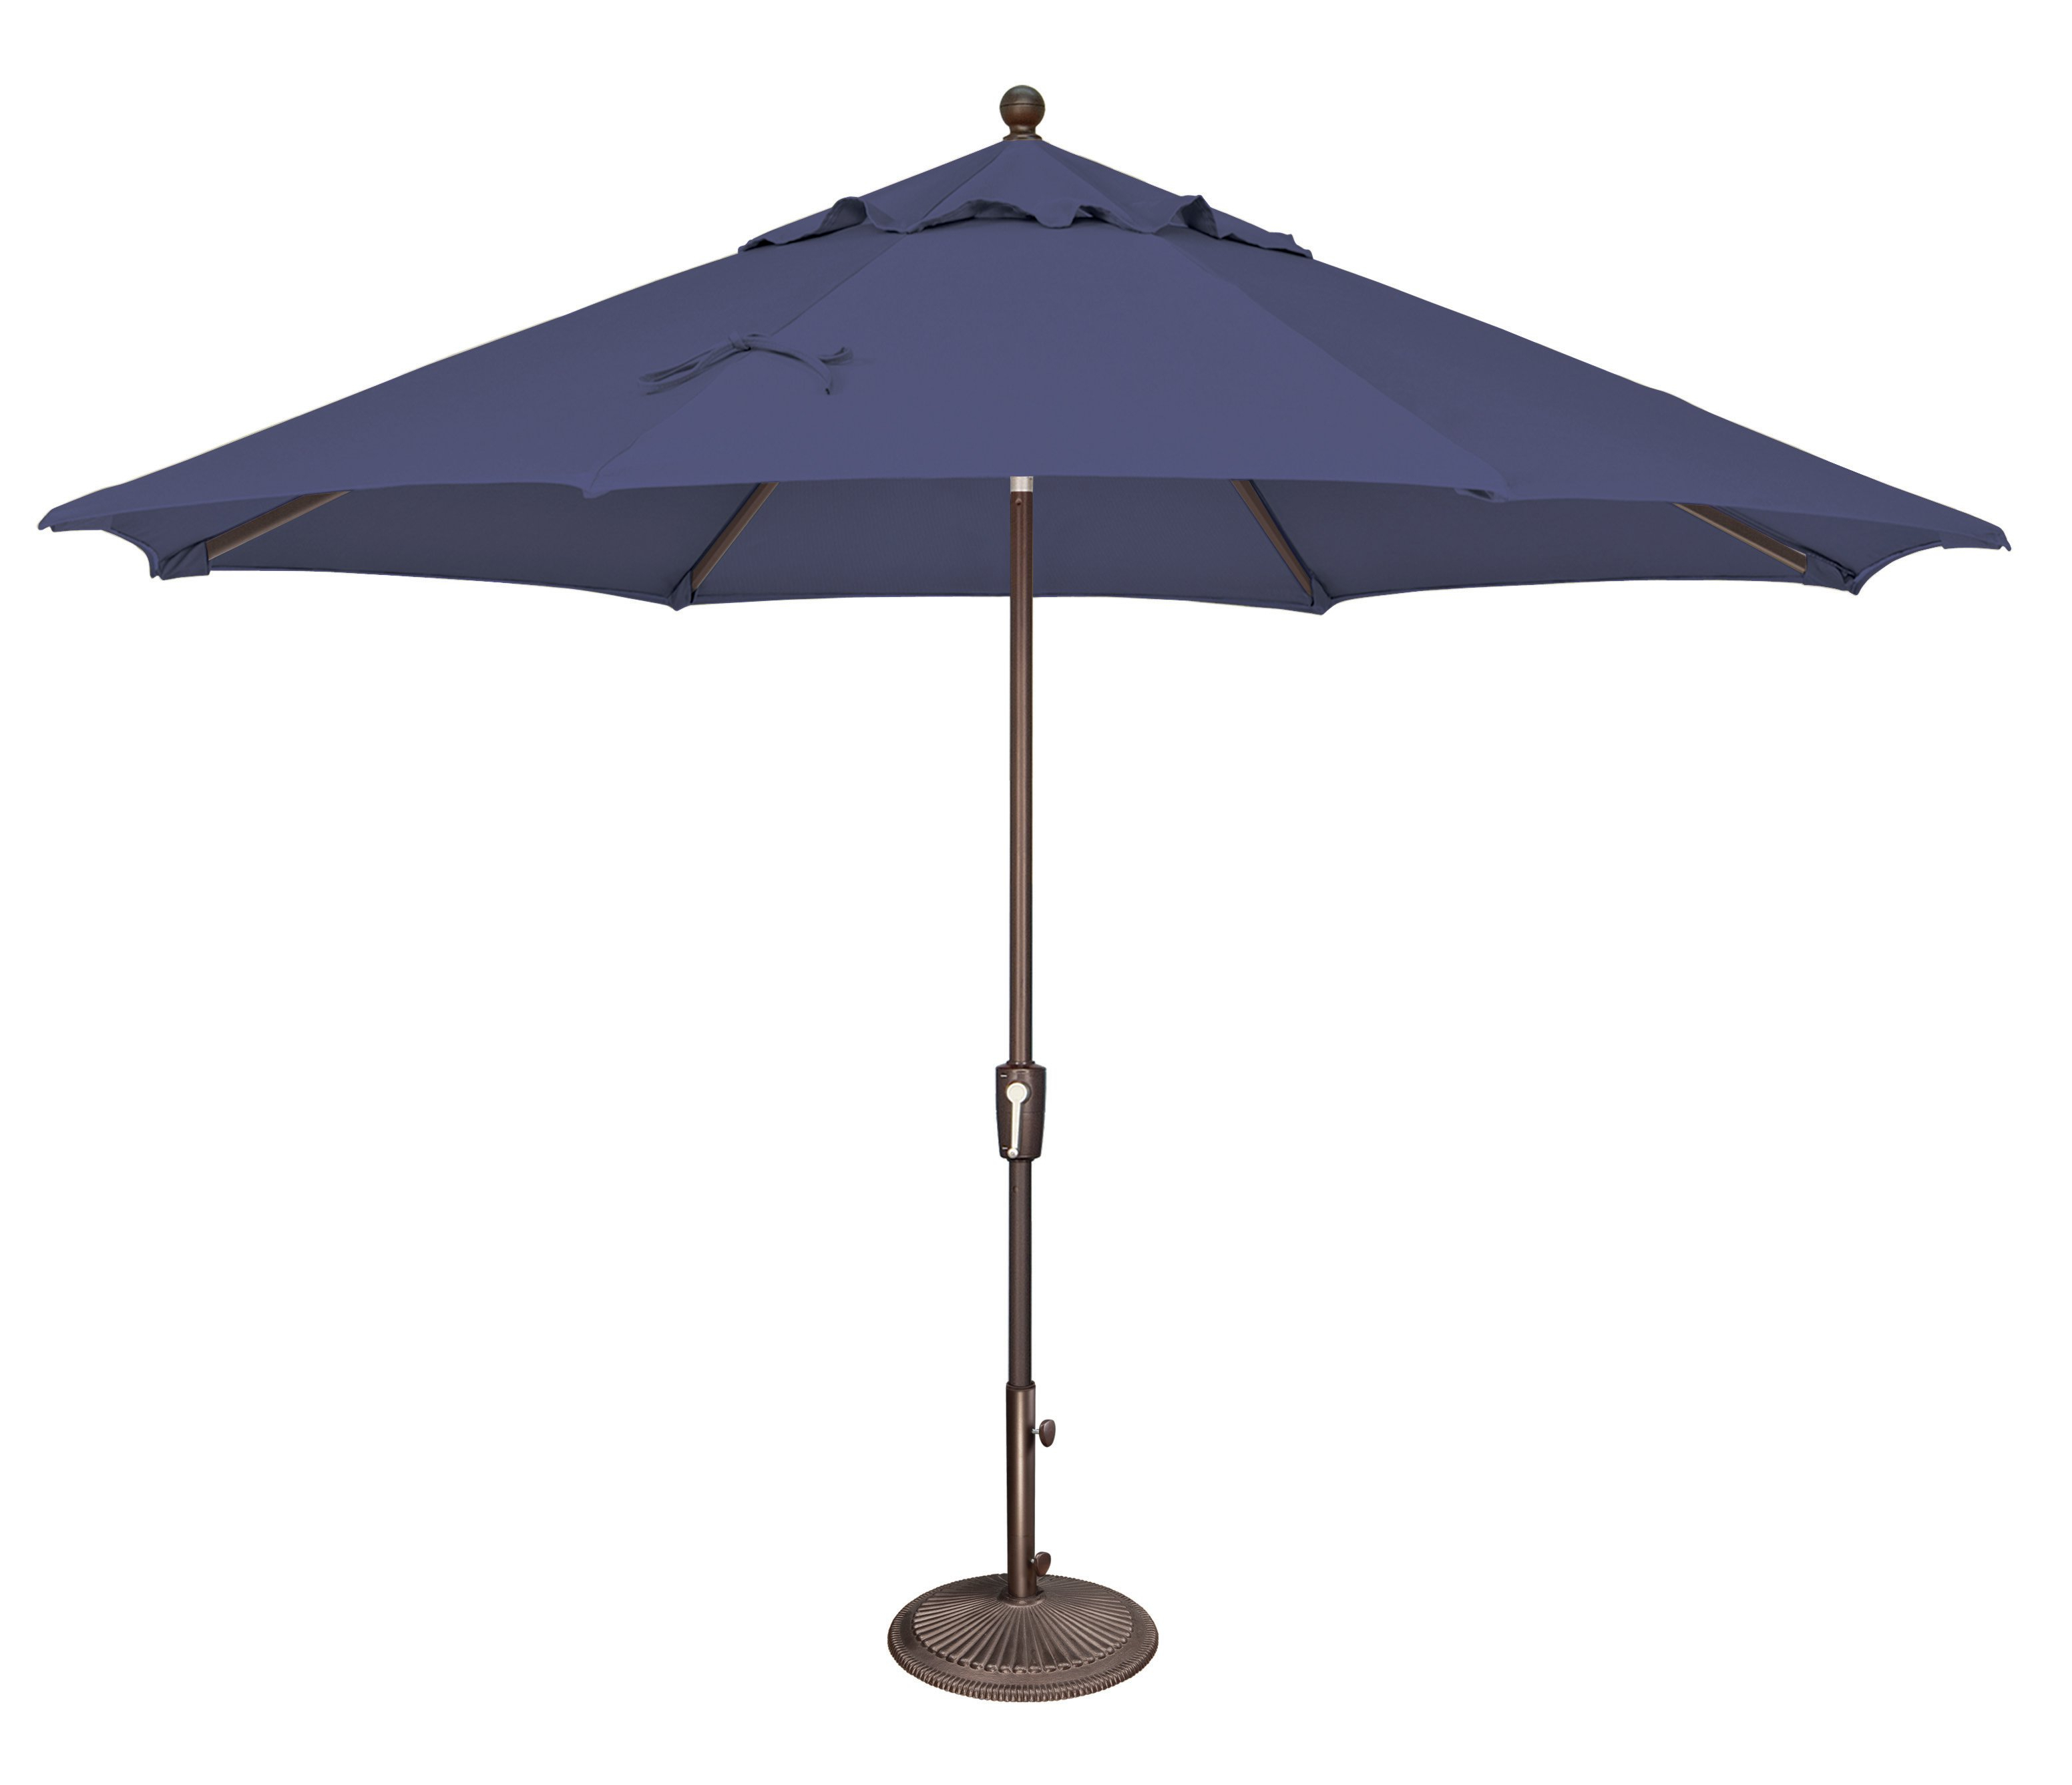 Launceston 11' Market Umbrella With Well Known Wallach Market Sunbrella Umbrellas (View 9 of 20)